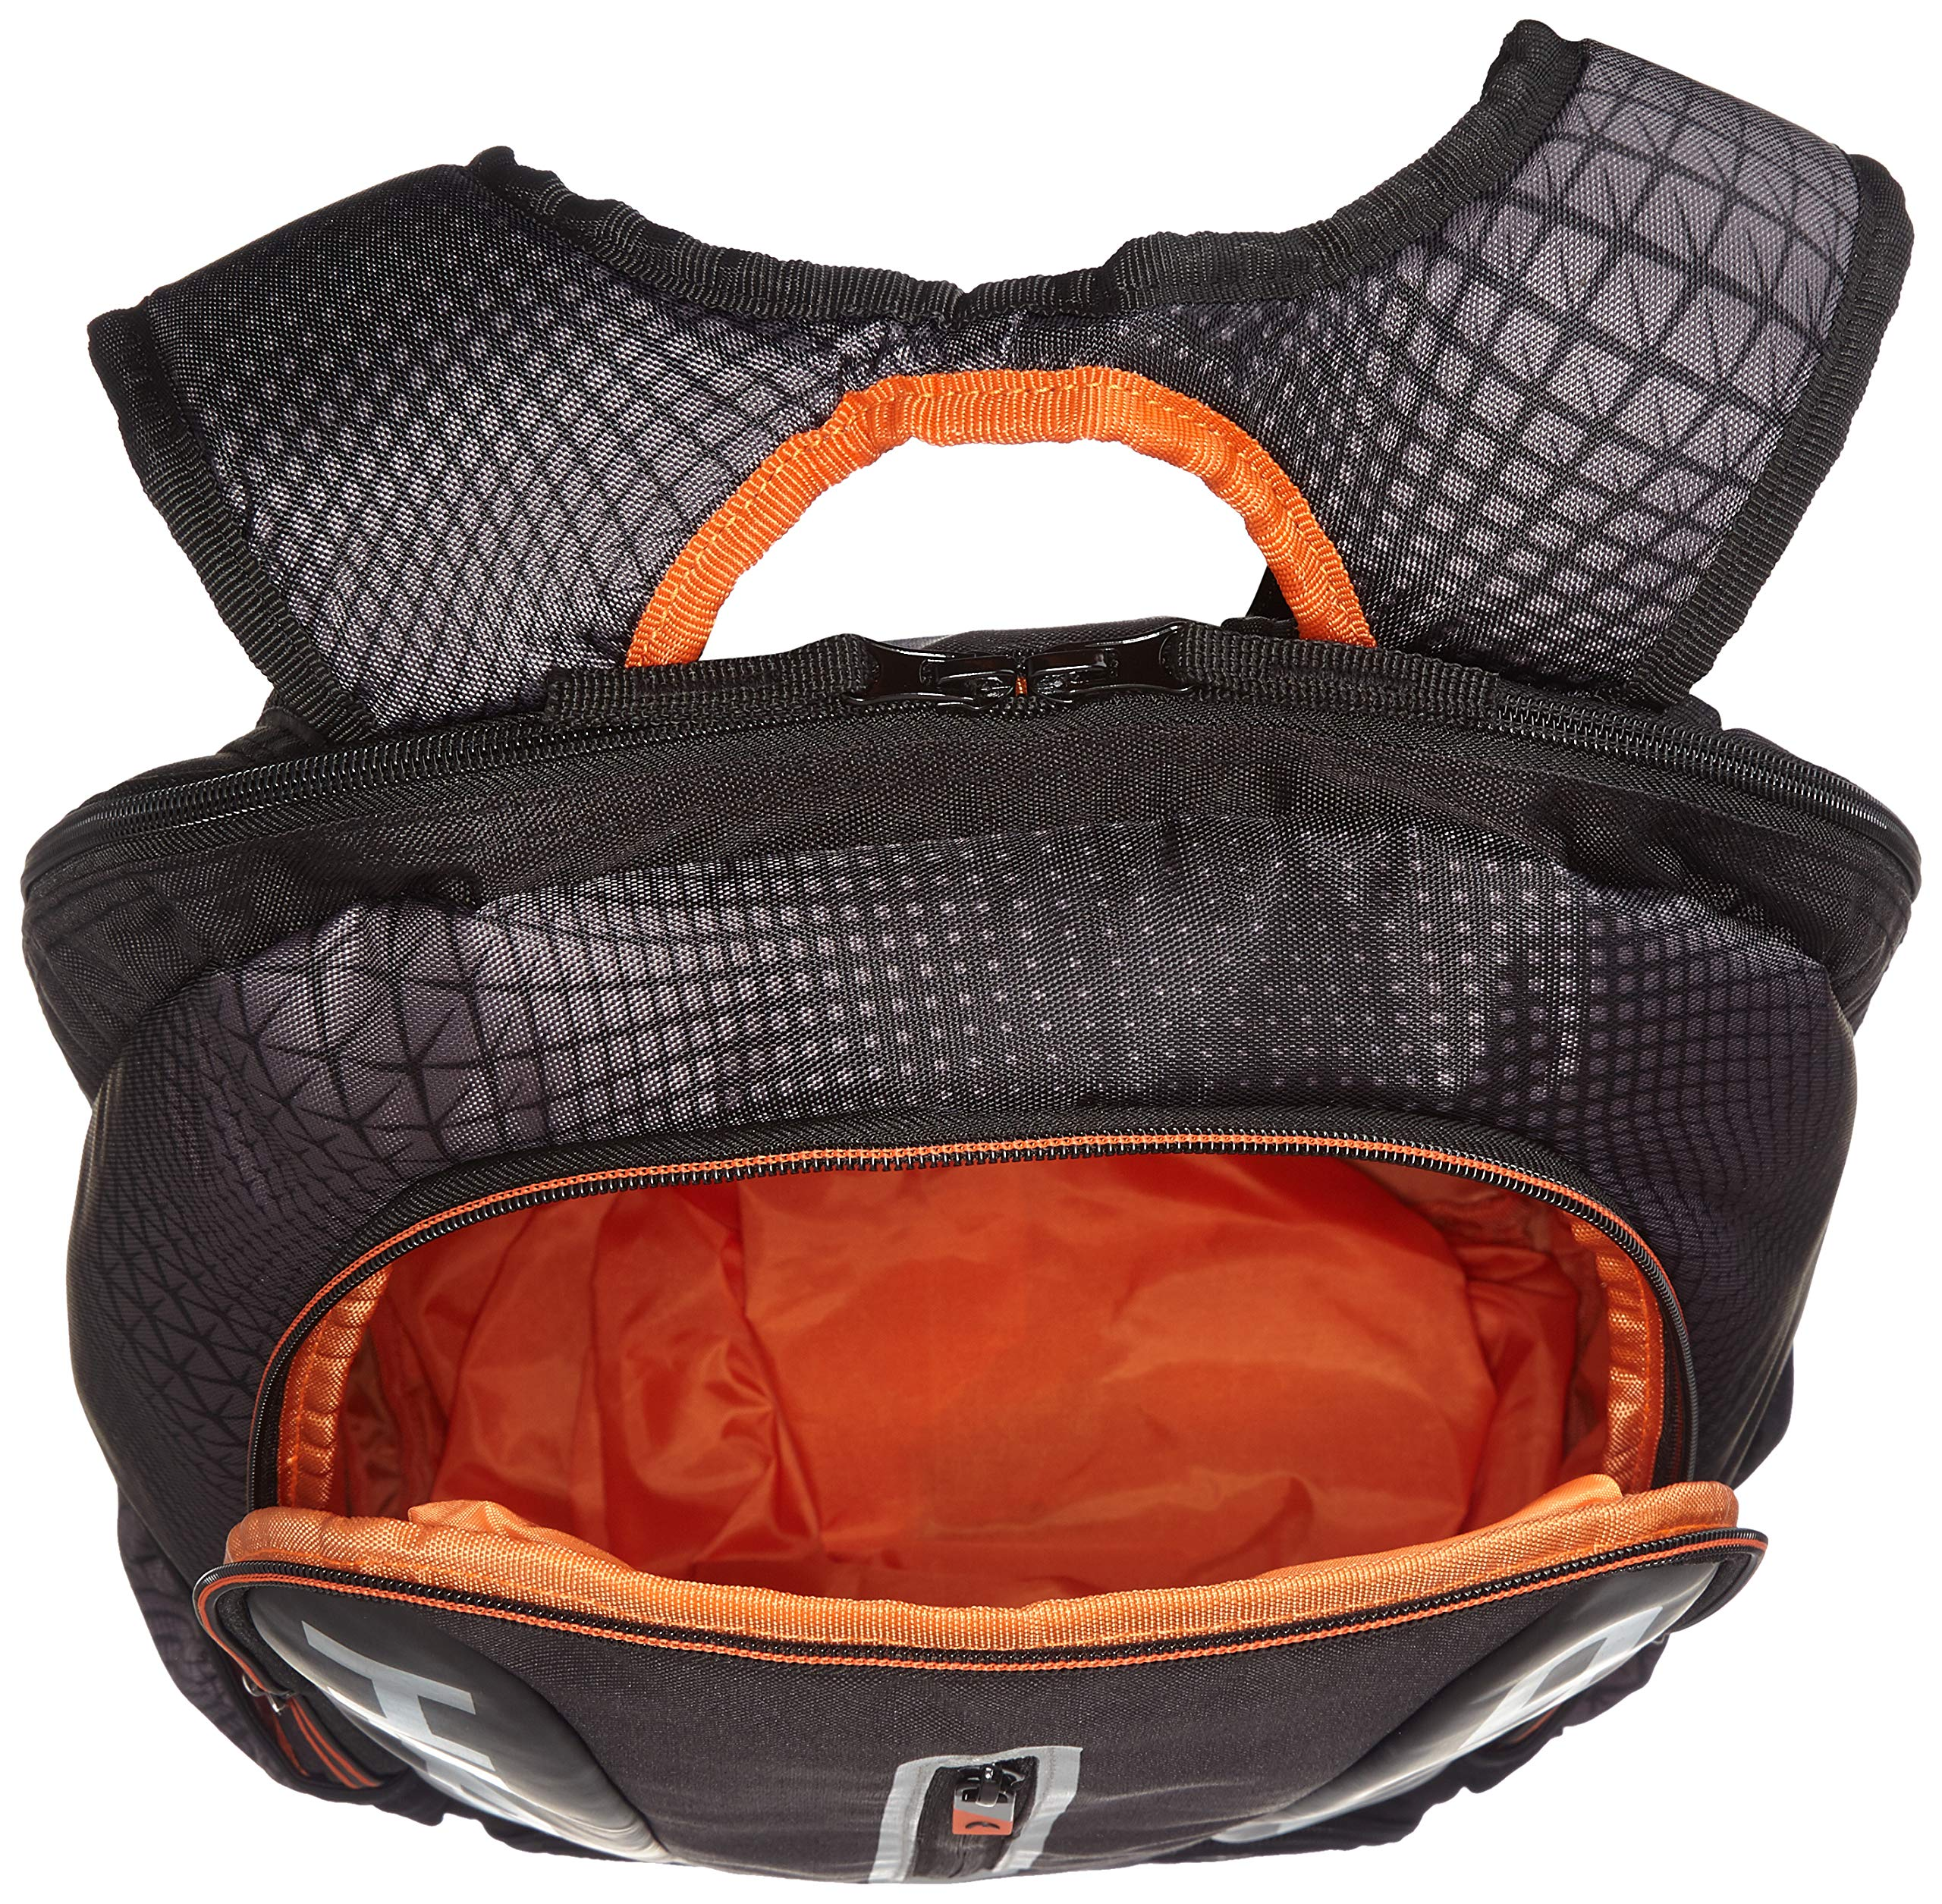 Head Tour Team Backpack, Borsa per Racchetta Unisex Adulto 3 spesavip